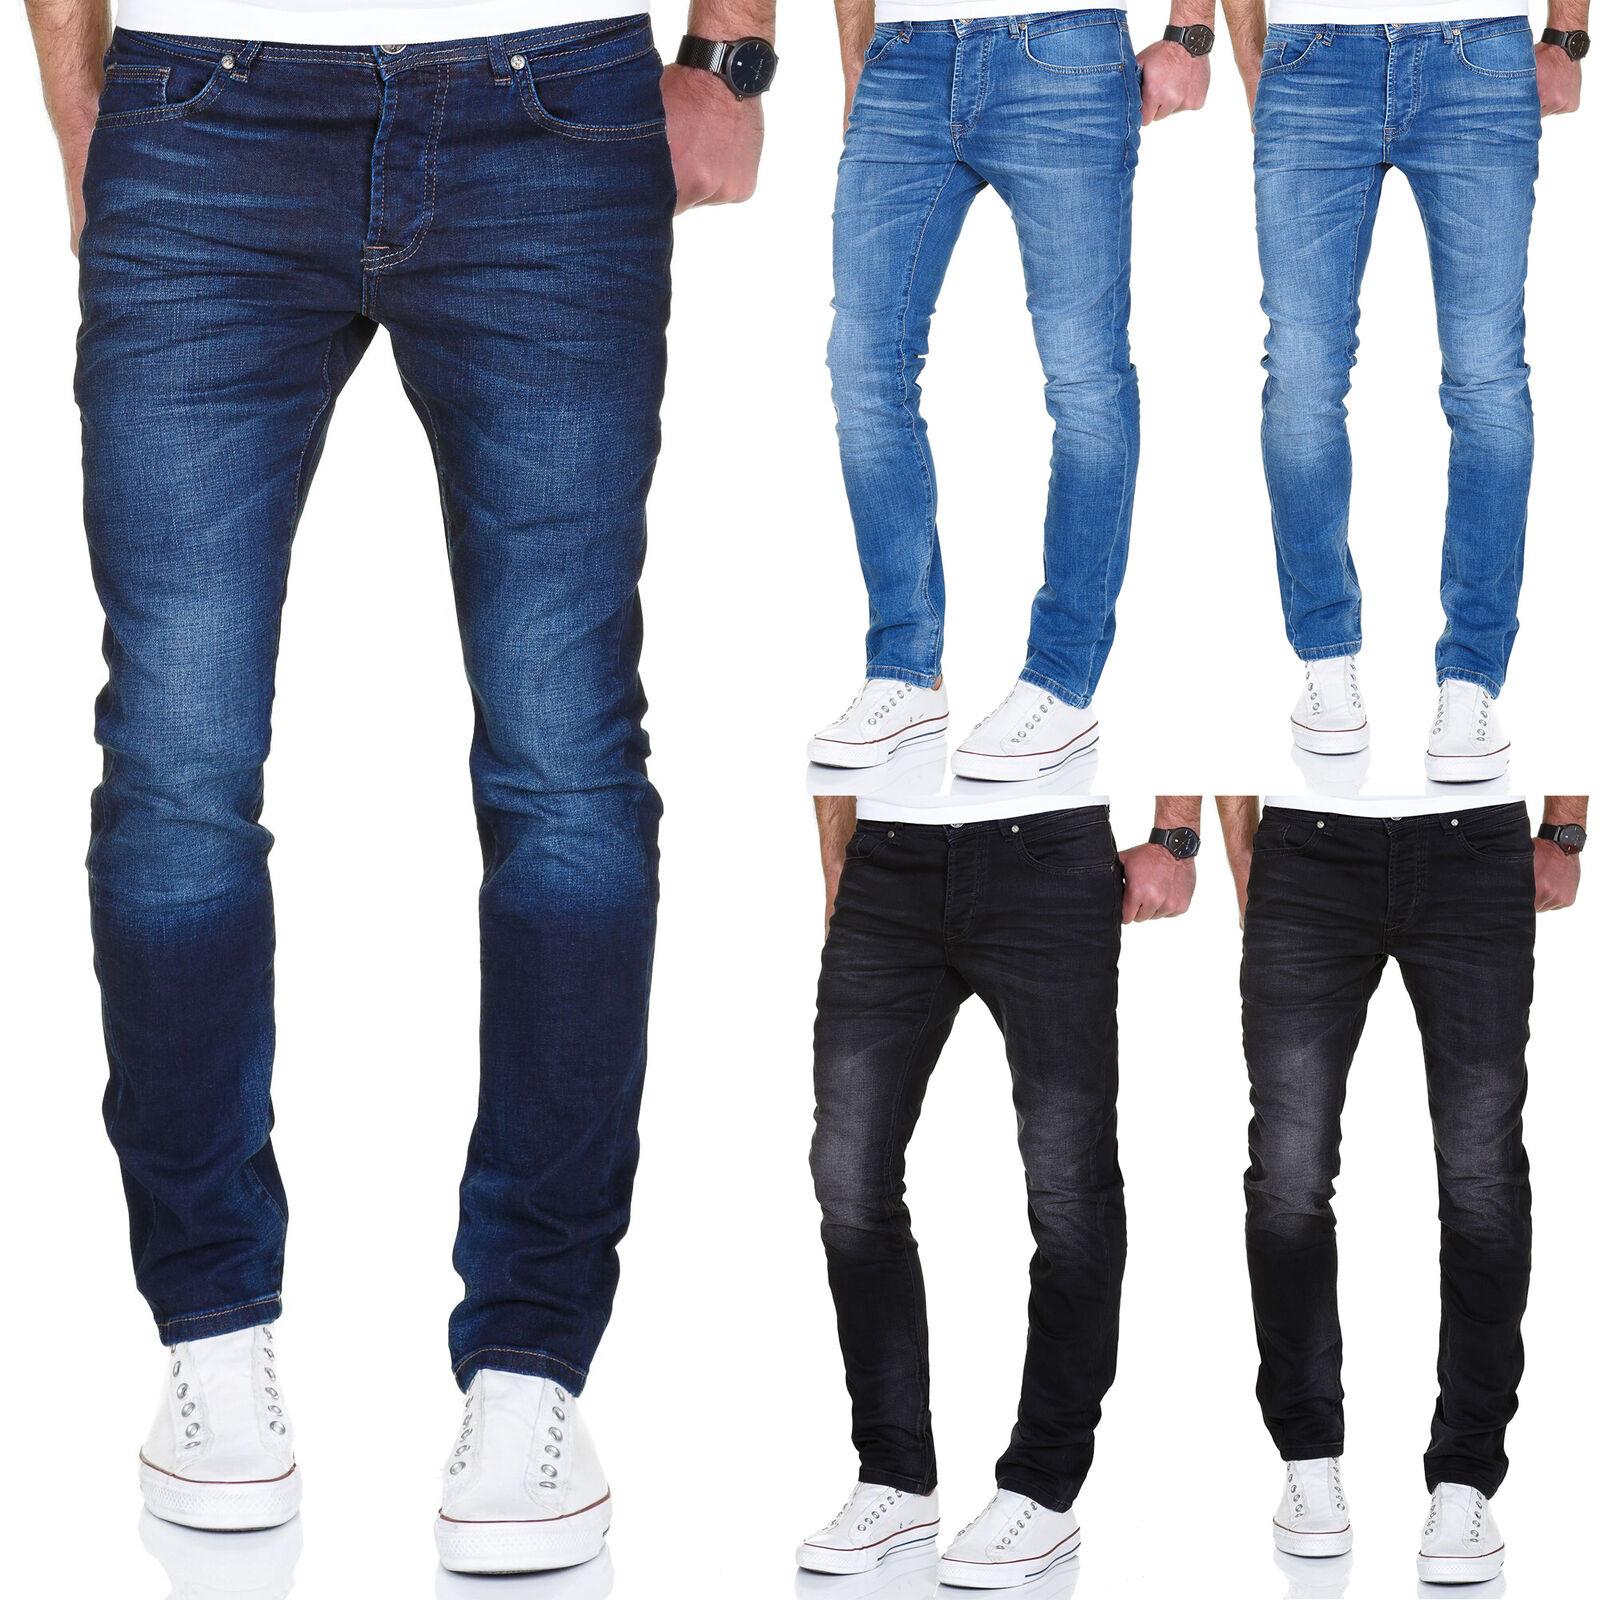 Herren Stretch Crinkle Basic Regular Slim Denim Jeans Hose 7986